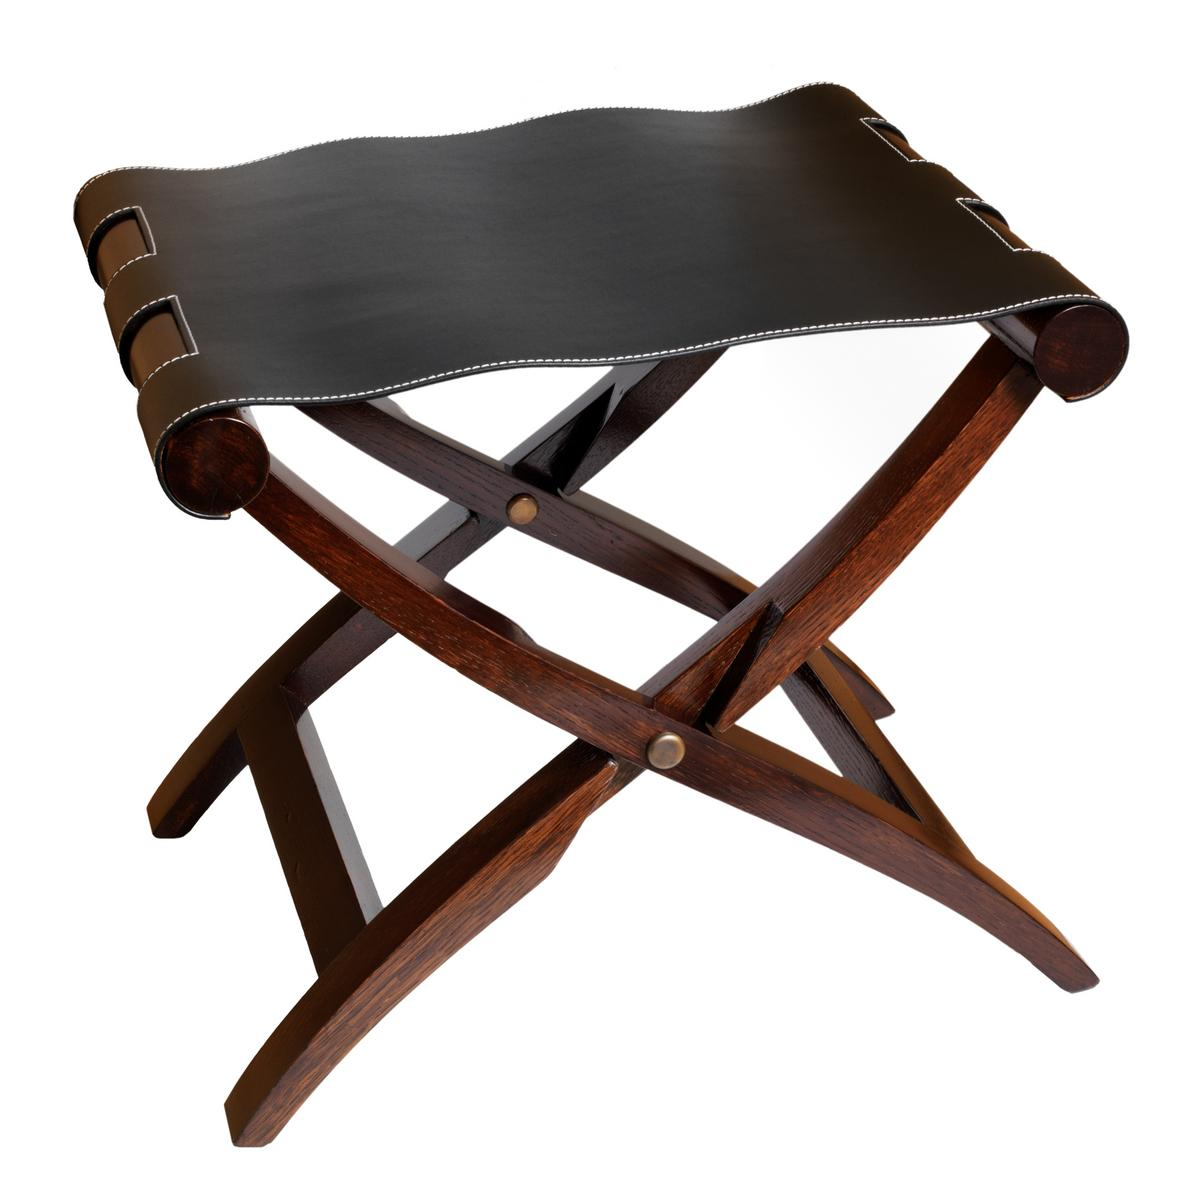 GioBagnara Arturo luggage rack dark brown weng233 wooden  : 1425053005407691 from www.artedona.com size 839 x 840 jpeg 44kB